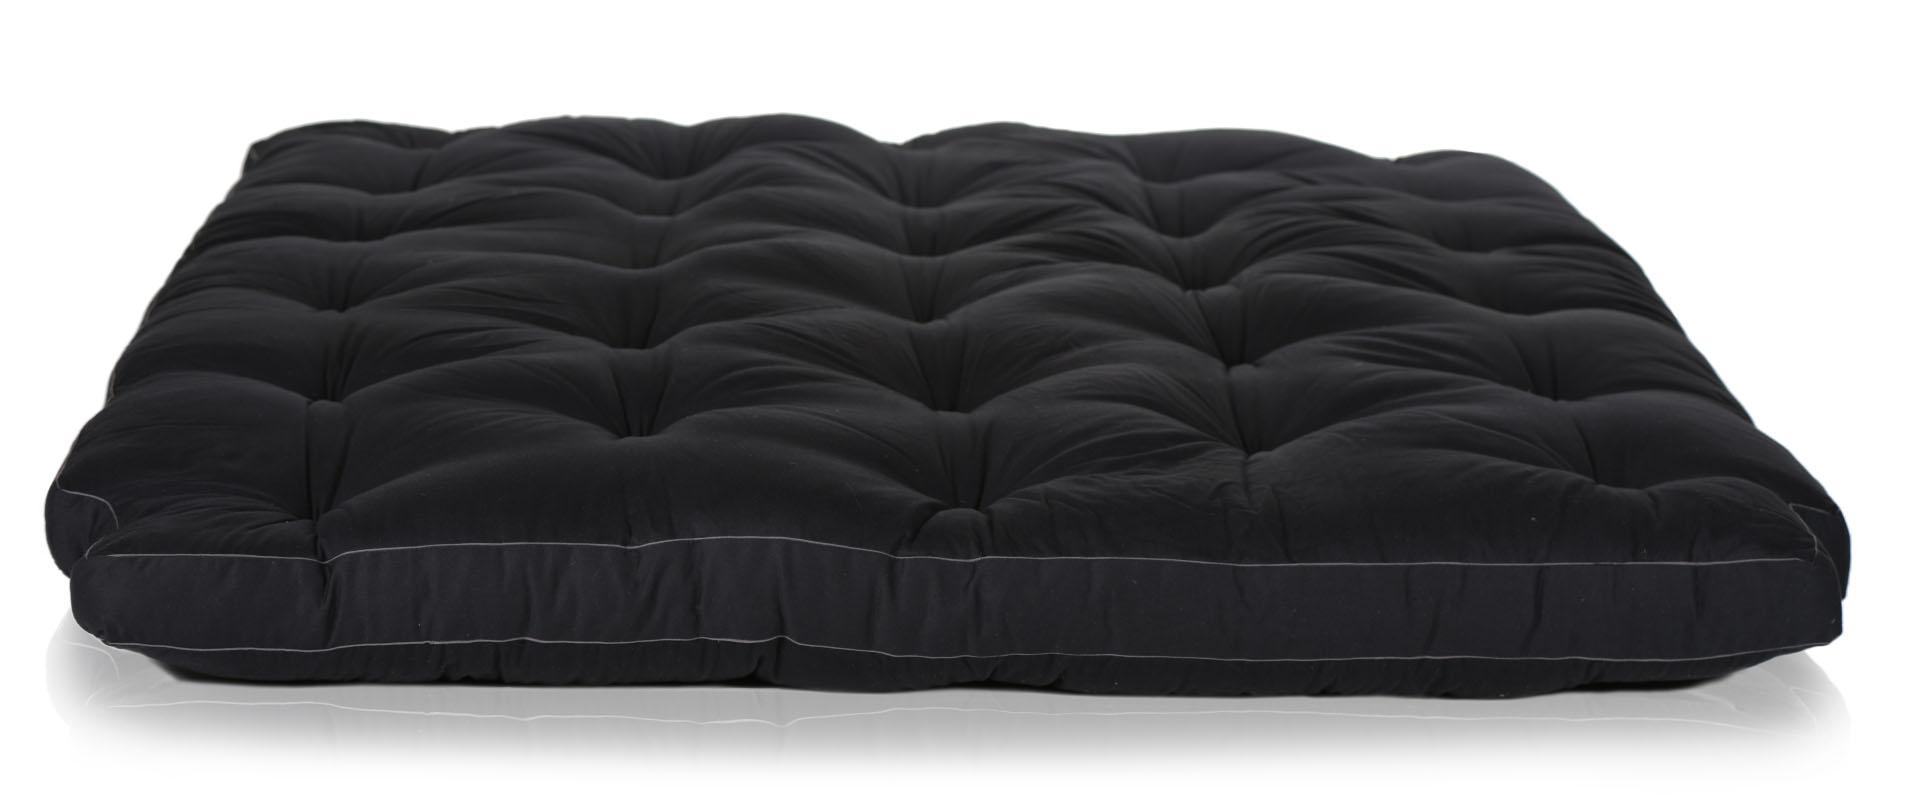 Multiflexboard mattress - sleeping mat, bed for VW T5/T6